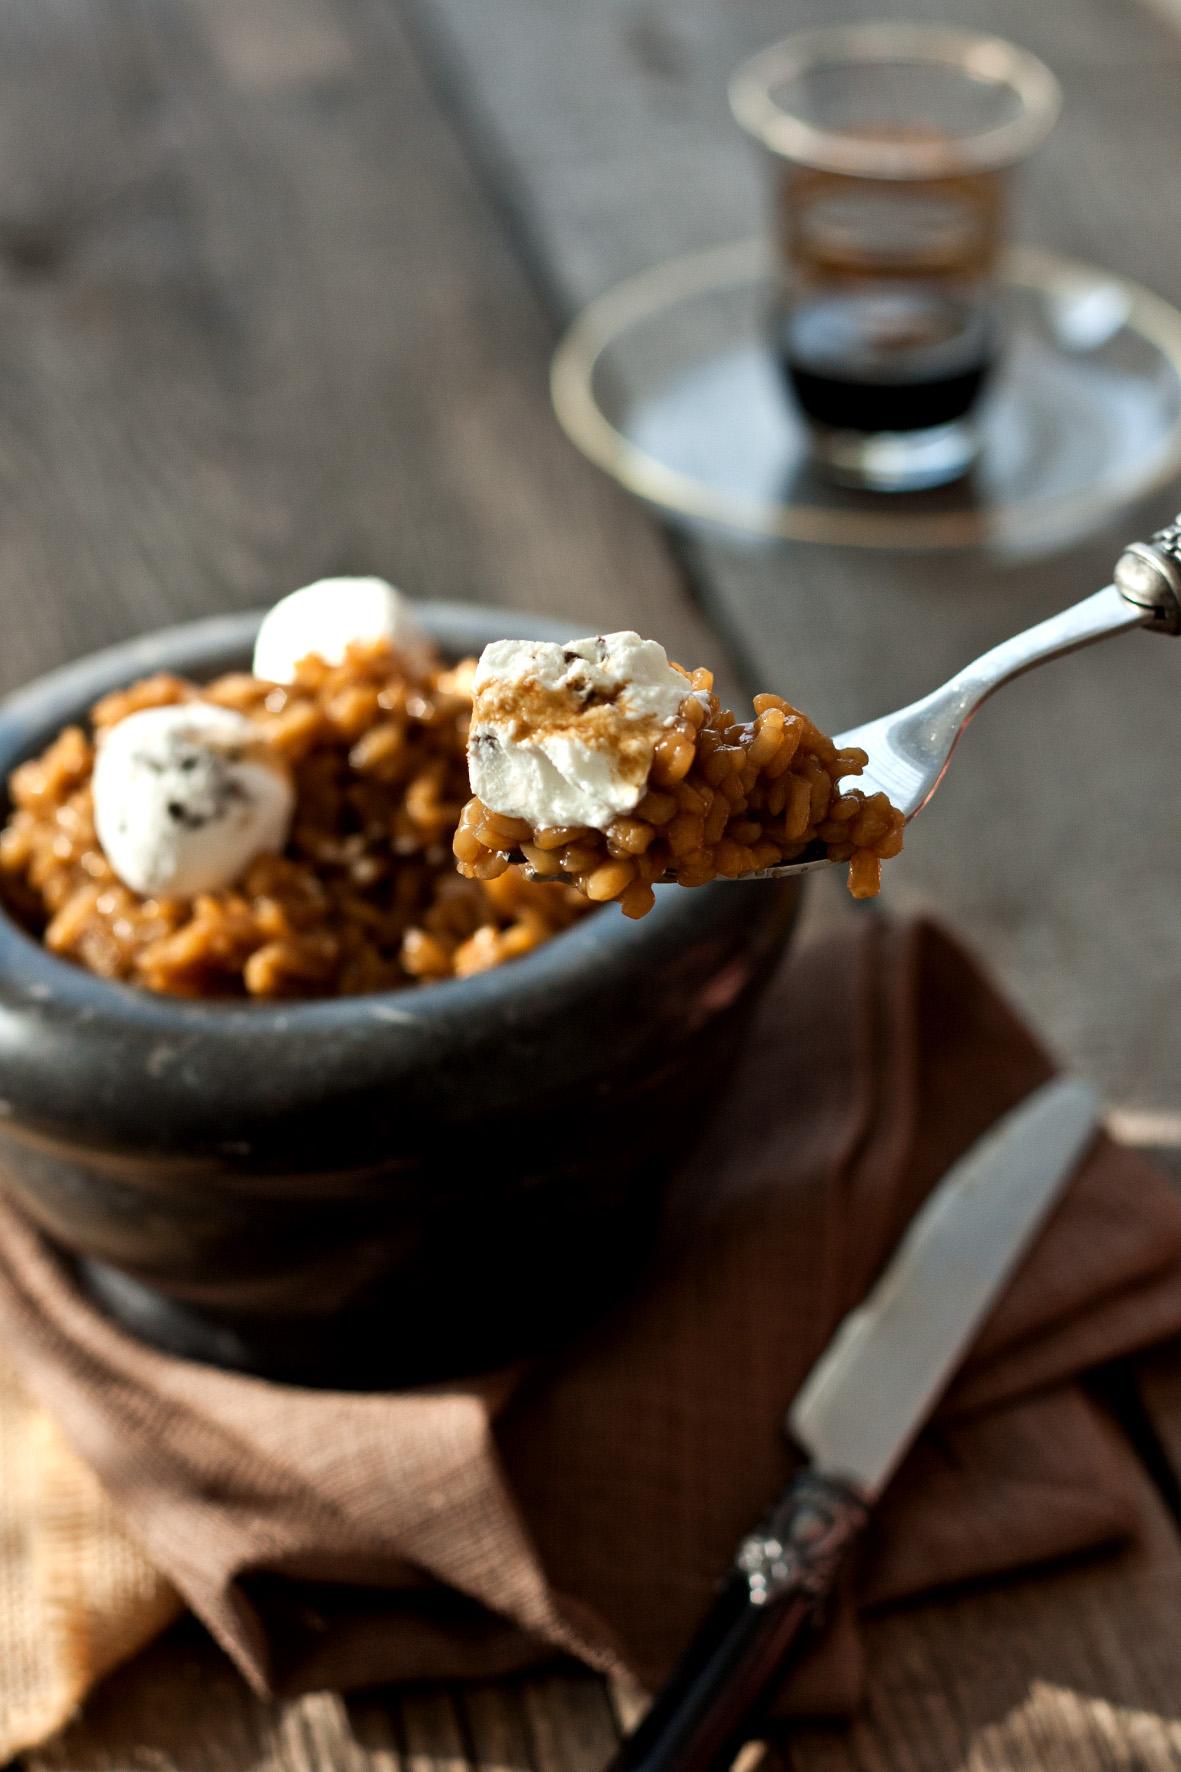 kaffee-risotto-ziegenkaese-2